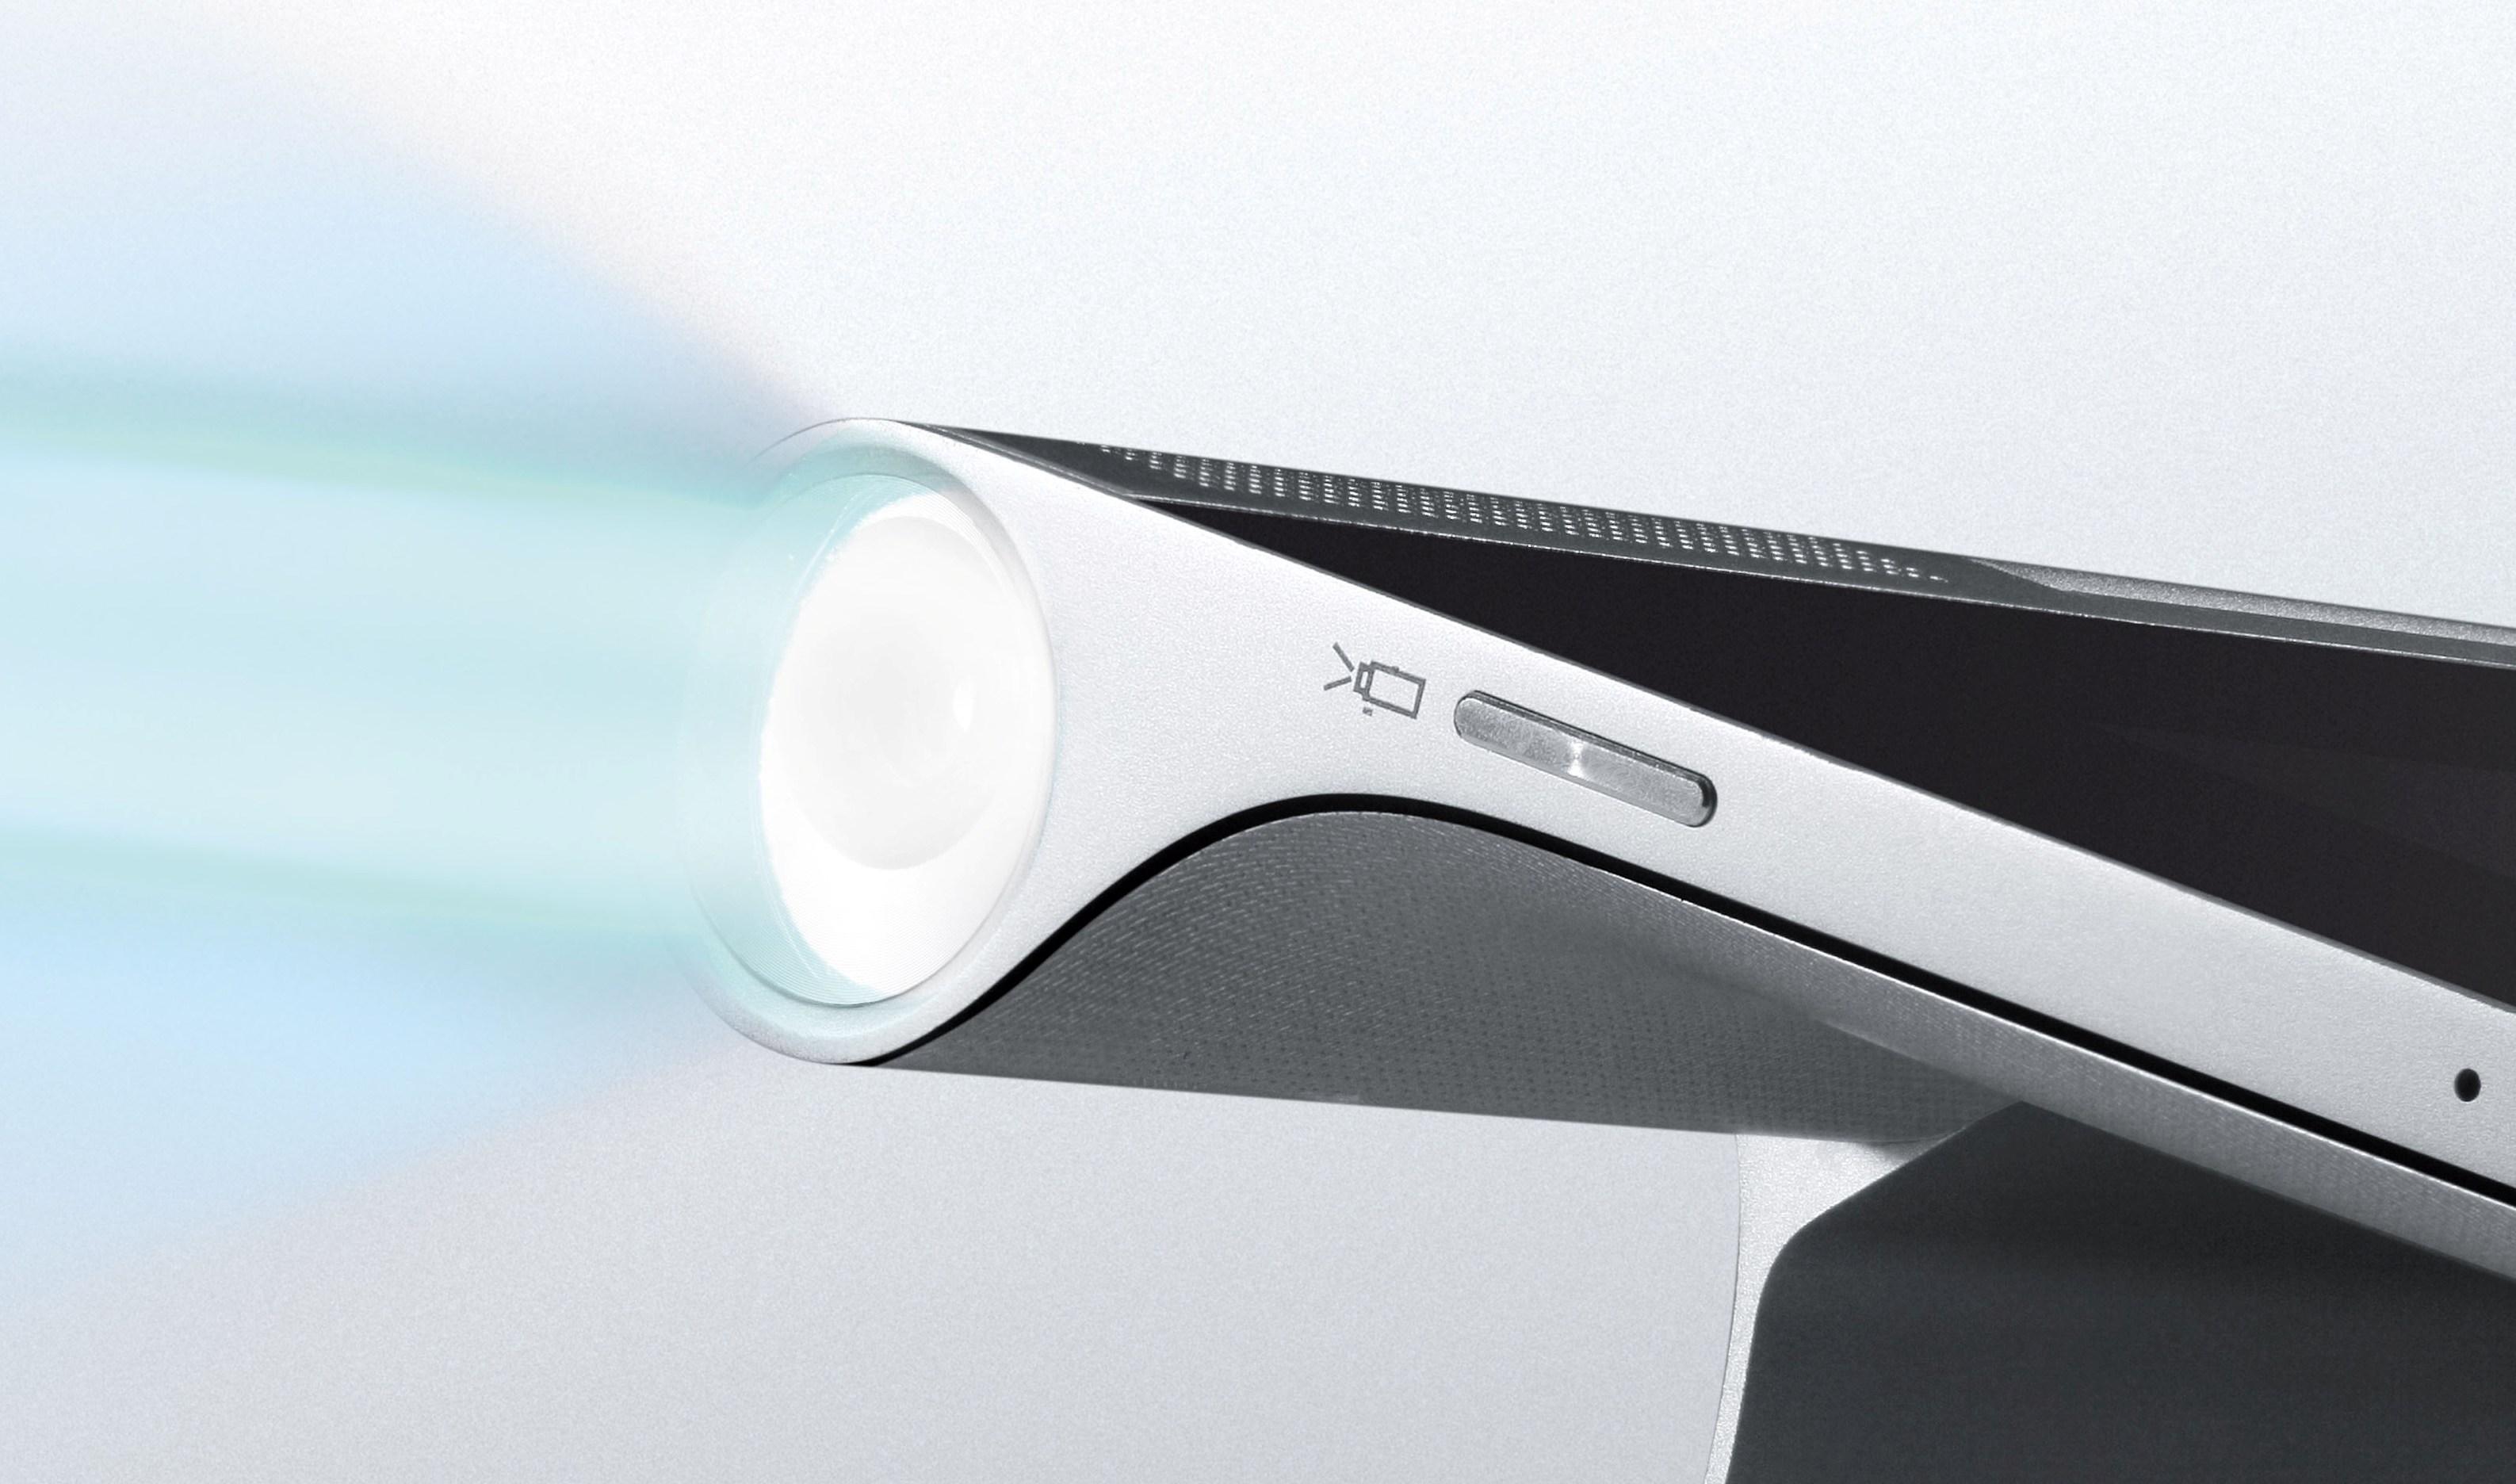 Lenovo Yoga 2 13 PRO Wi-Fi Silver